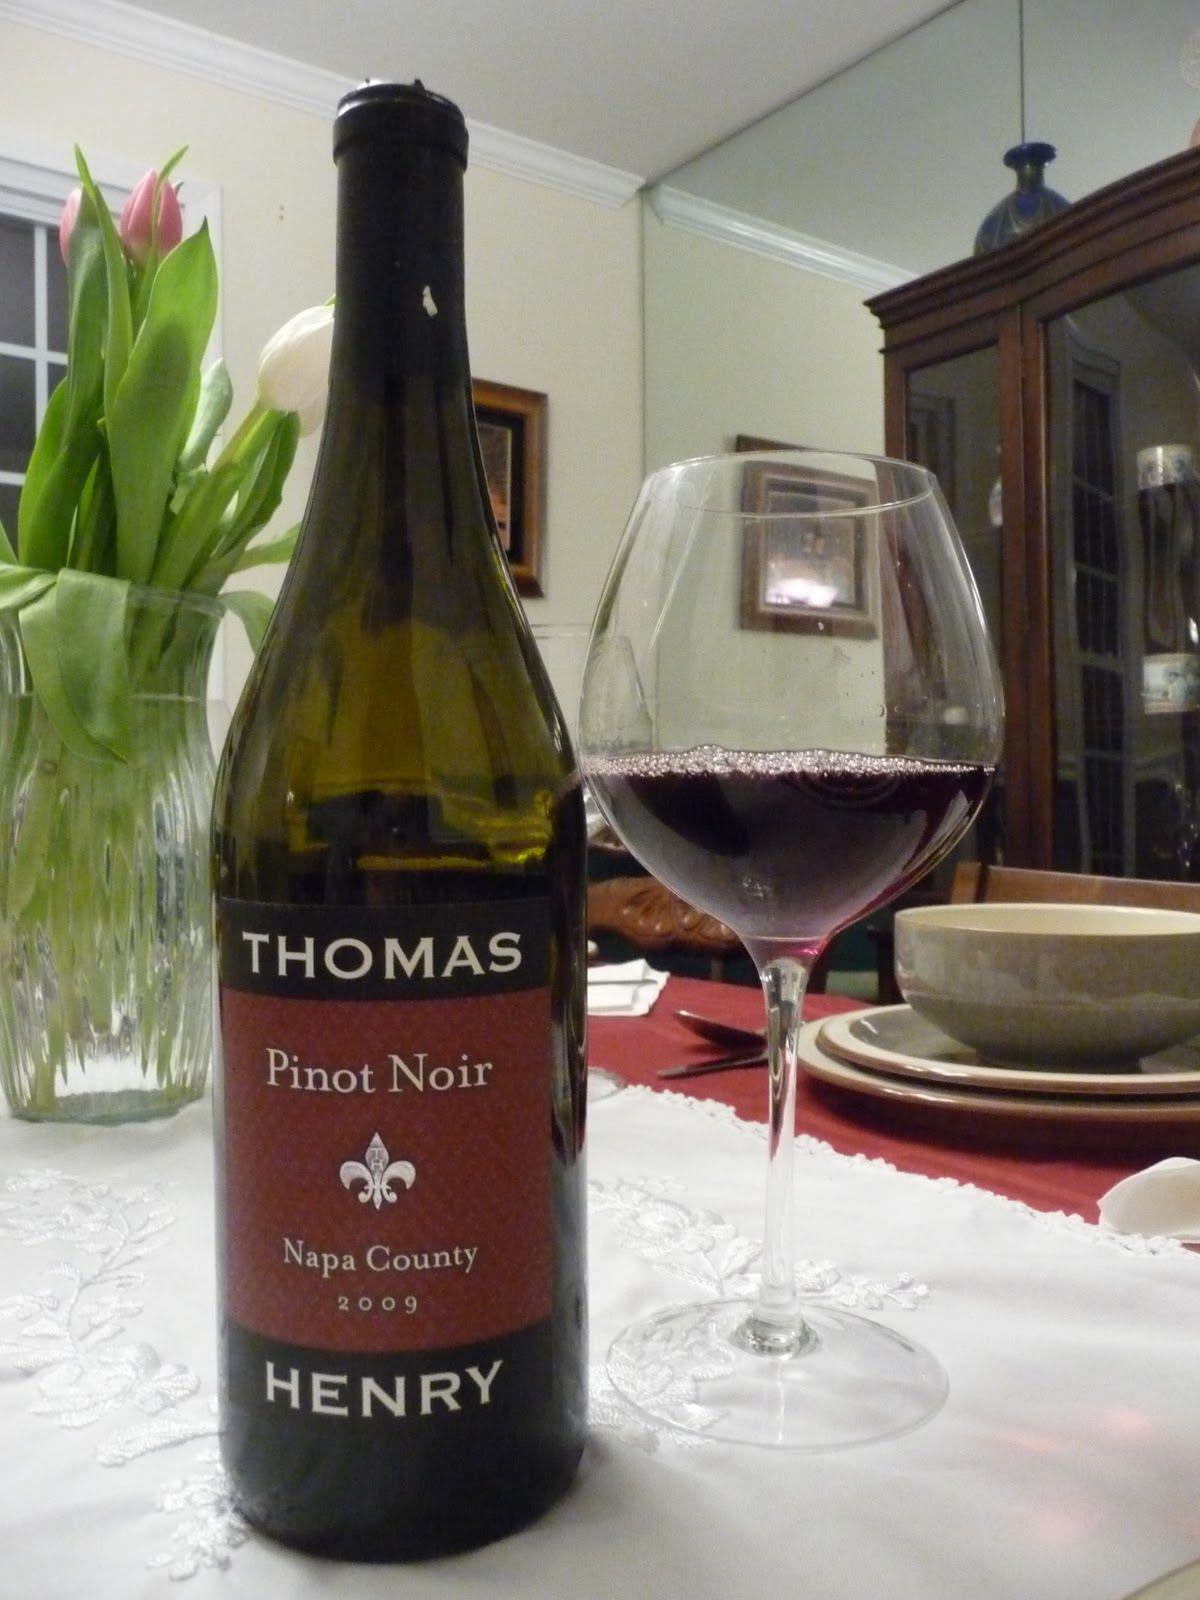 thomas henry wines | Thomas Henry Pinot Noir (2009)